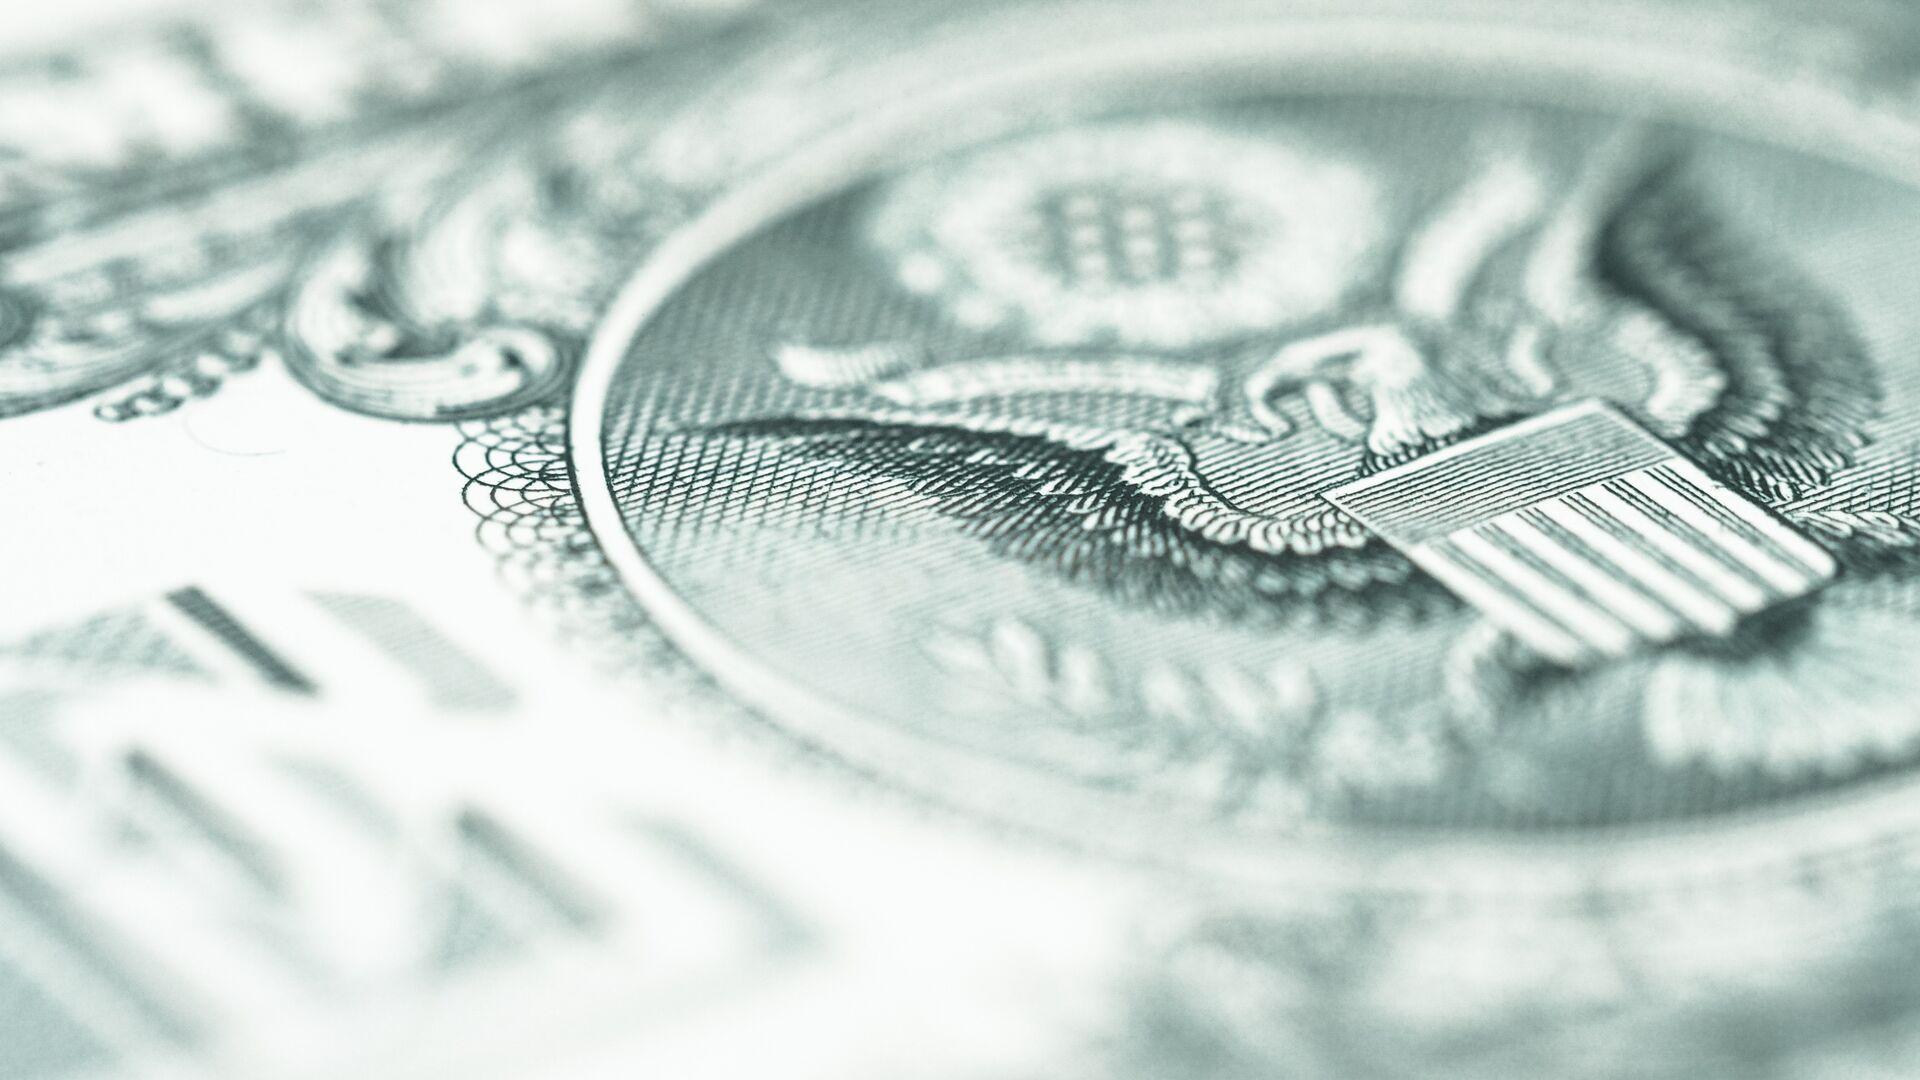 Un dólar (imagen referencial) - Sputnik Mundo, 1920, 09.02.2021